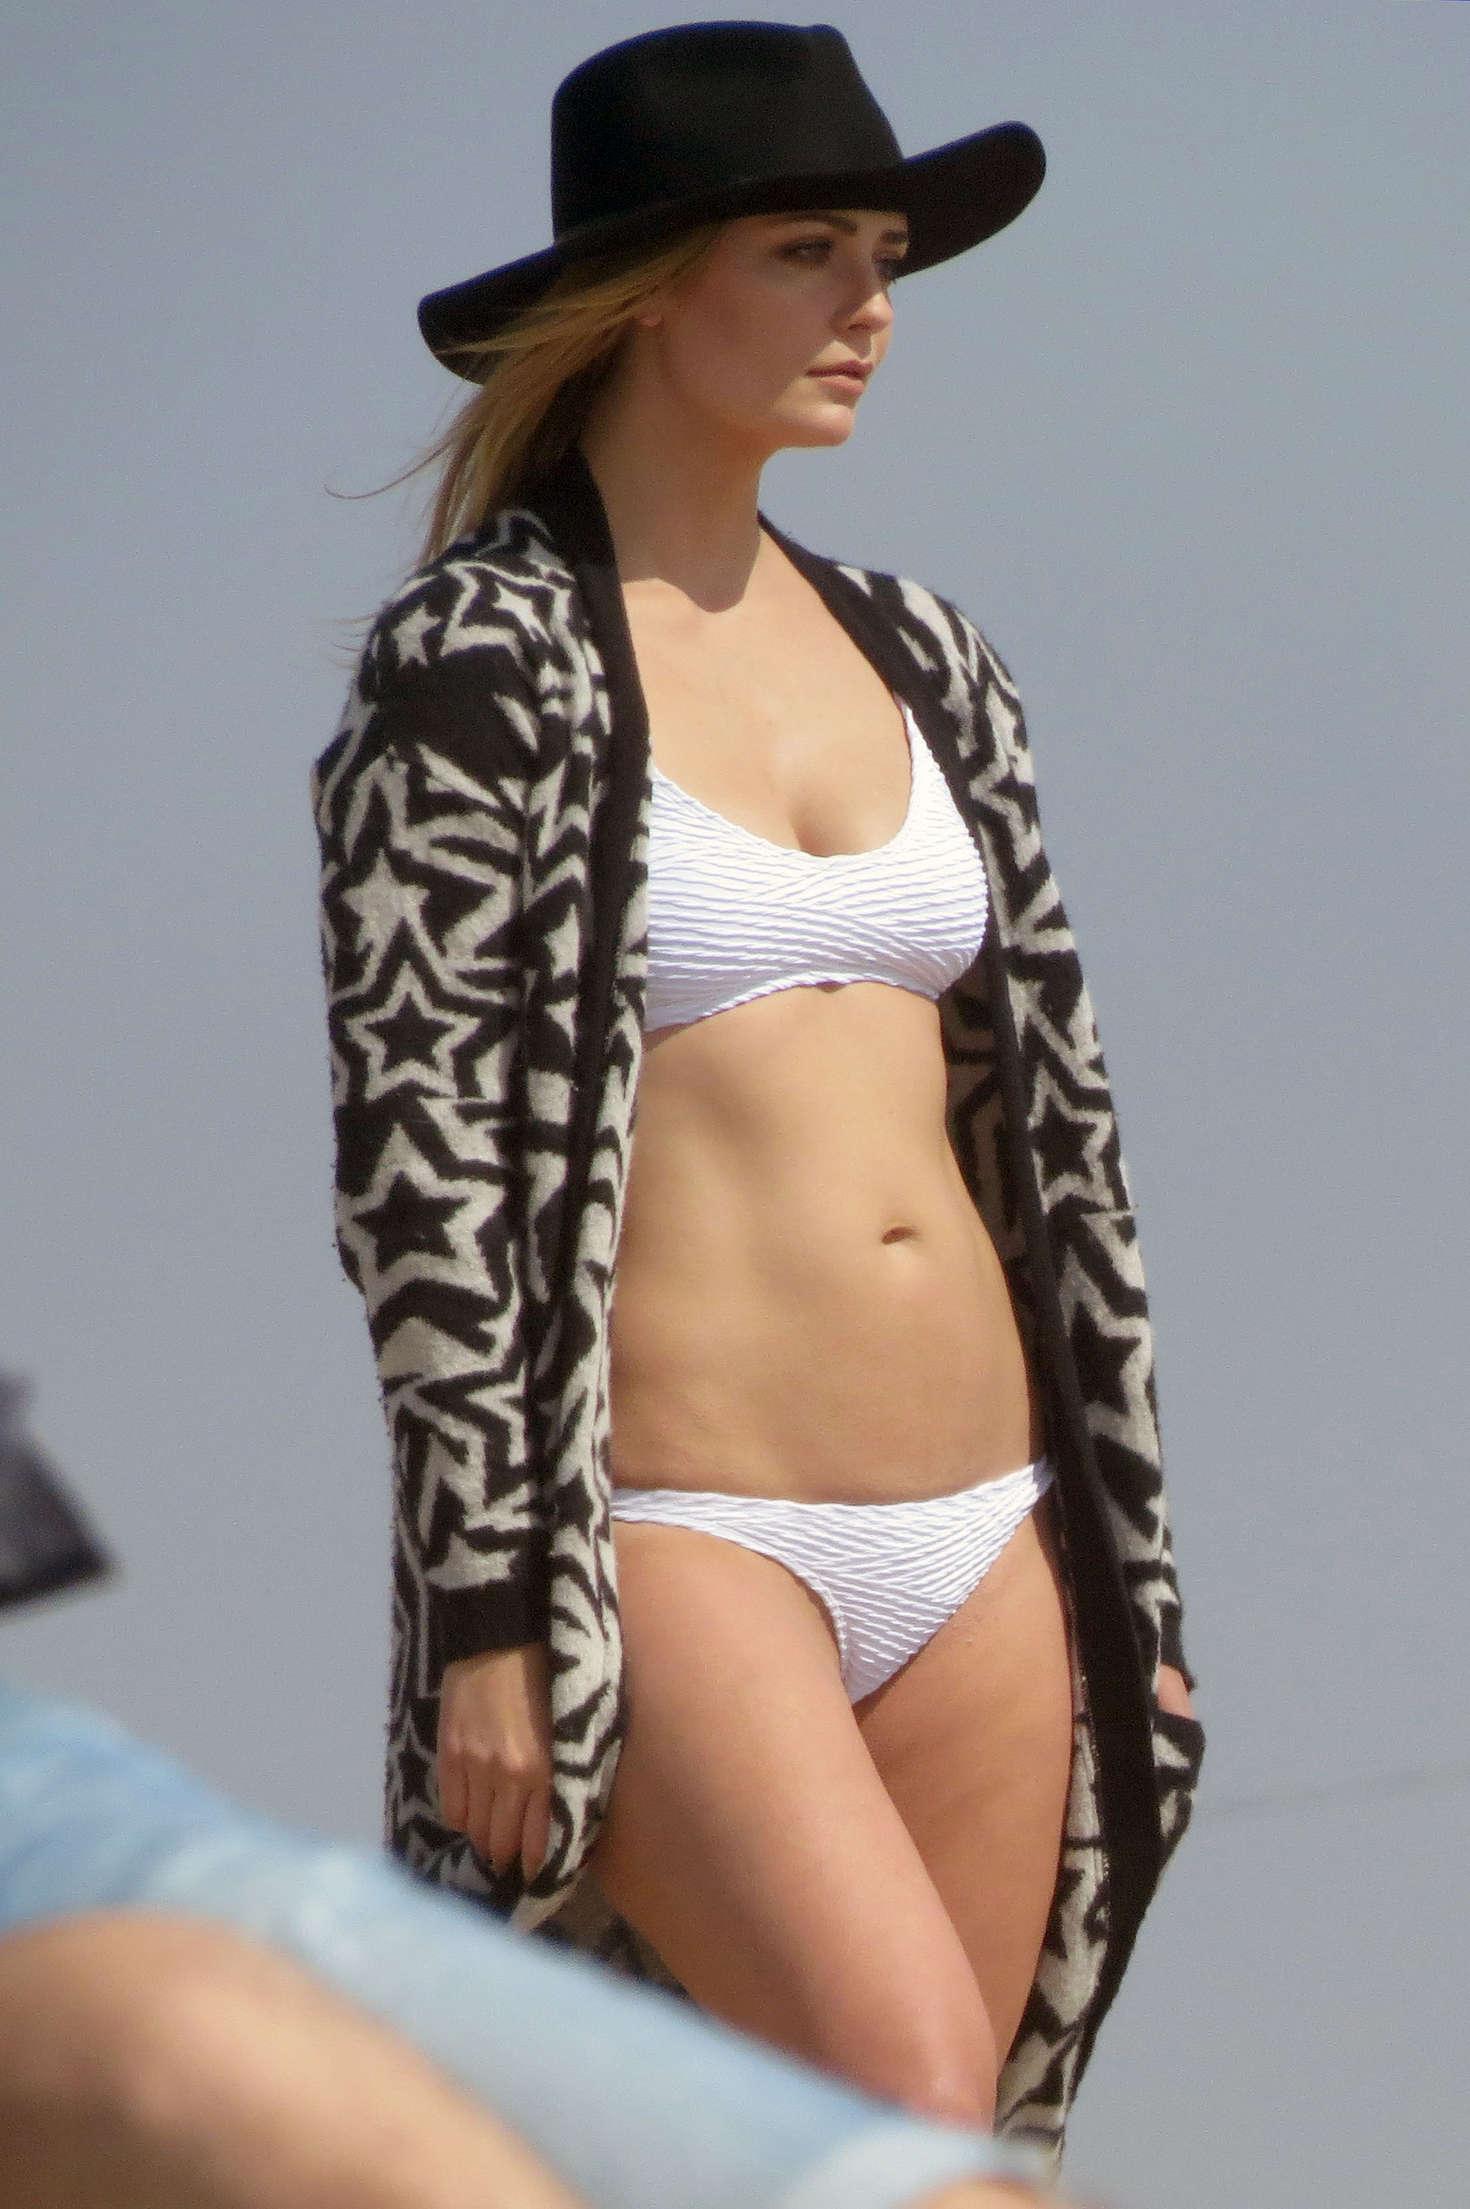 Jeans look bikini panty wetting - 2 2